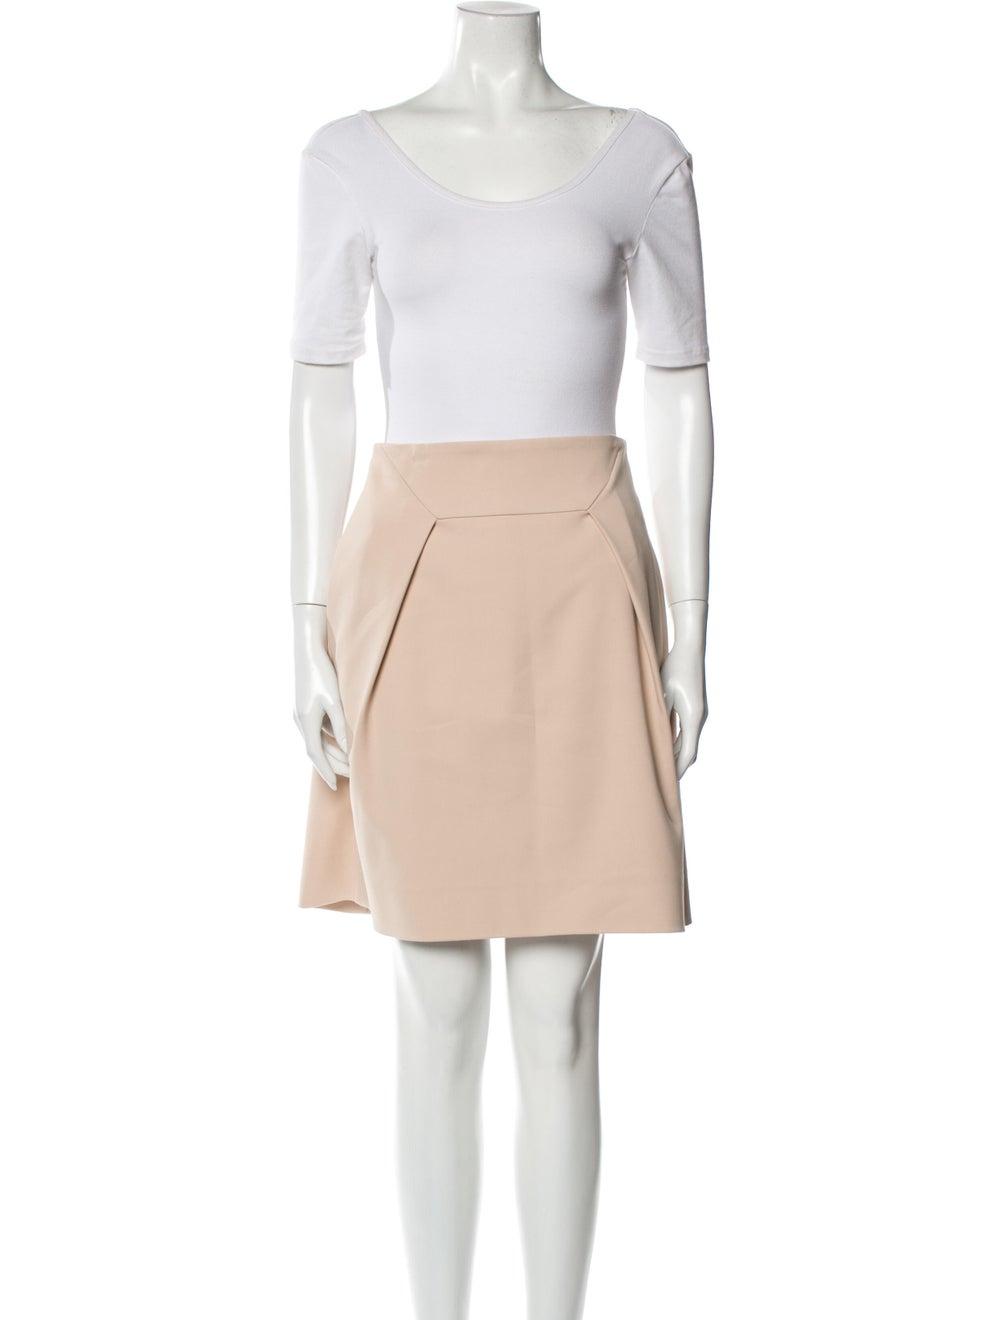 Tibi Skirt Set Brown - image 4